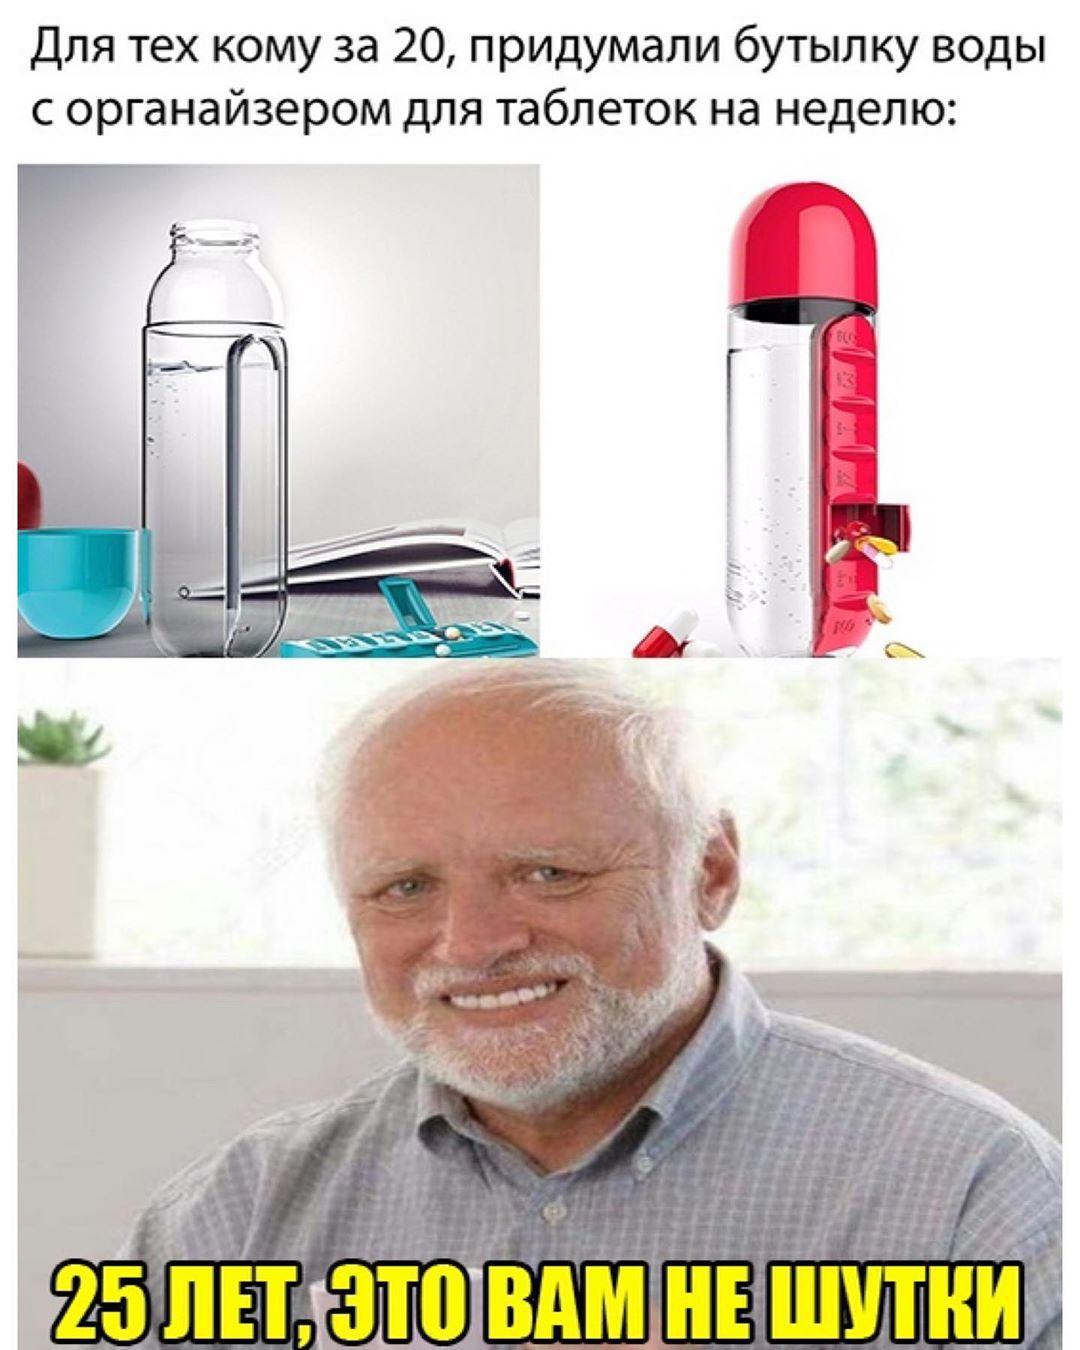 Бутылка для воды + органайзер для таблеток